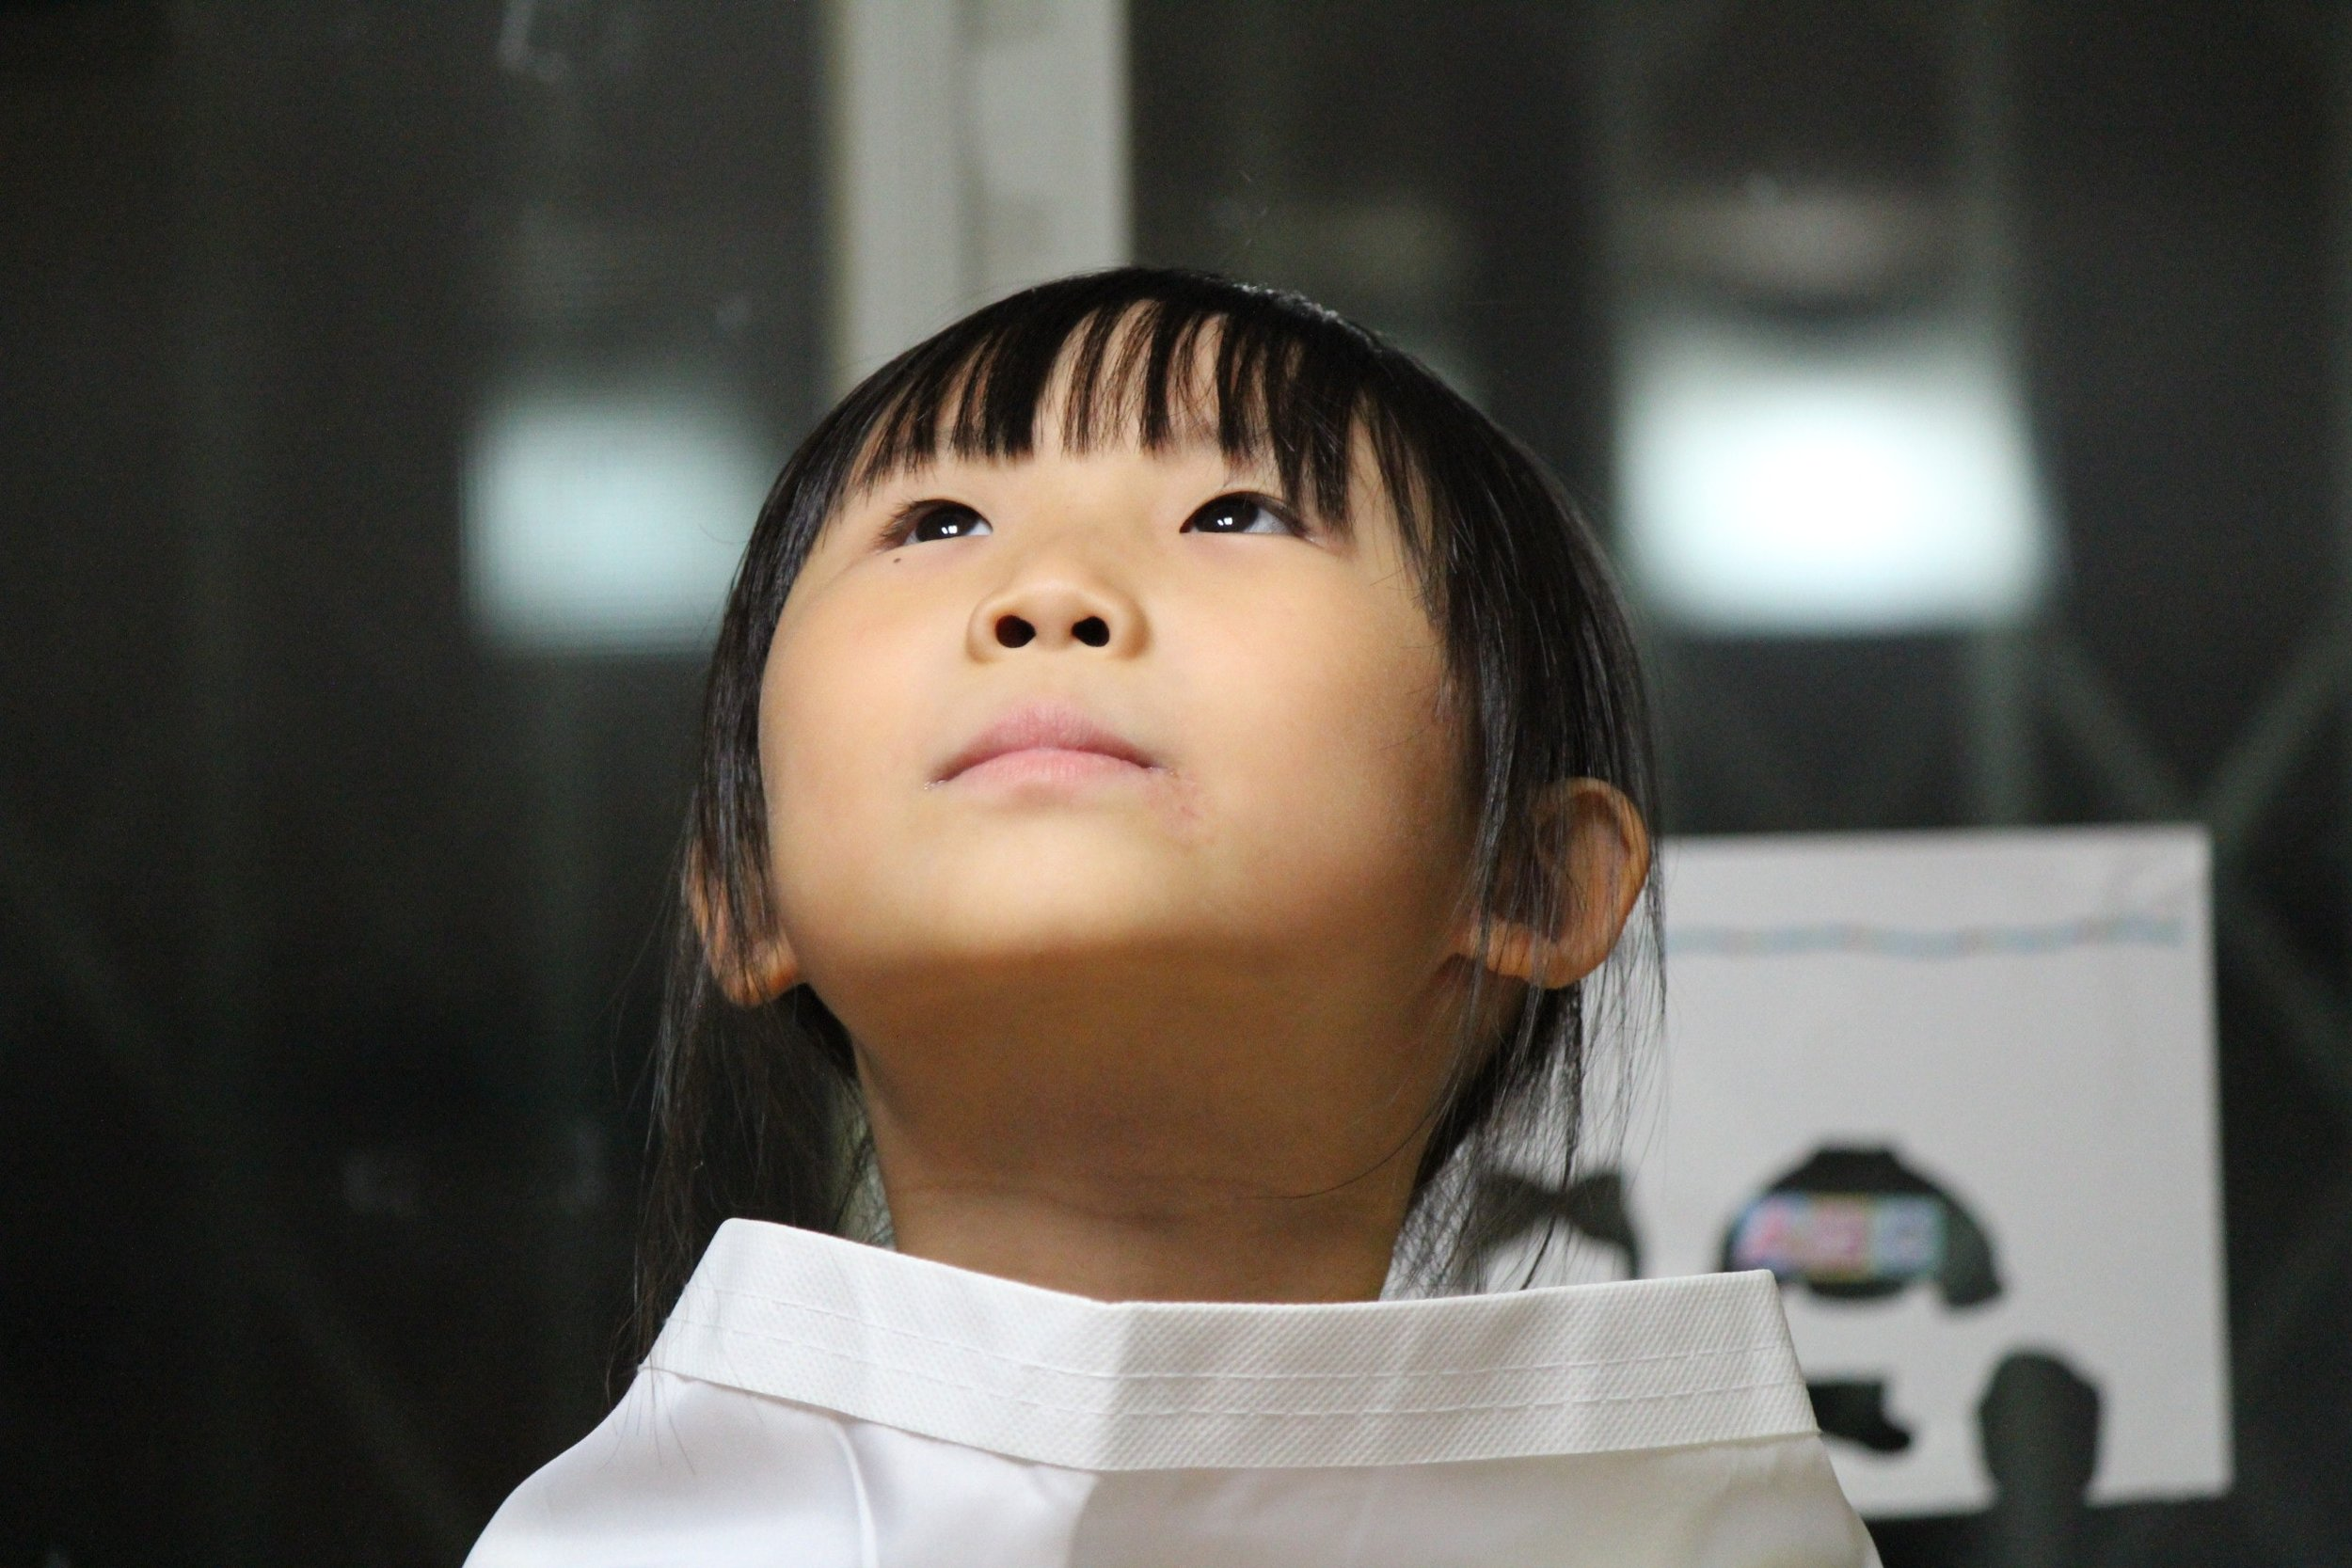 asian-child-curious-48124.jpg